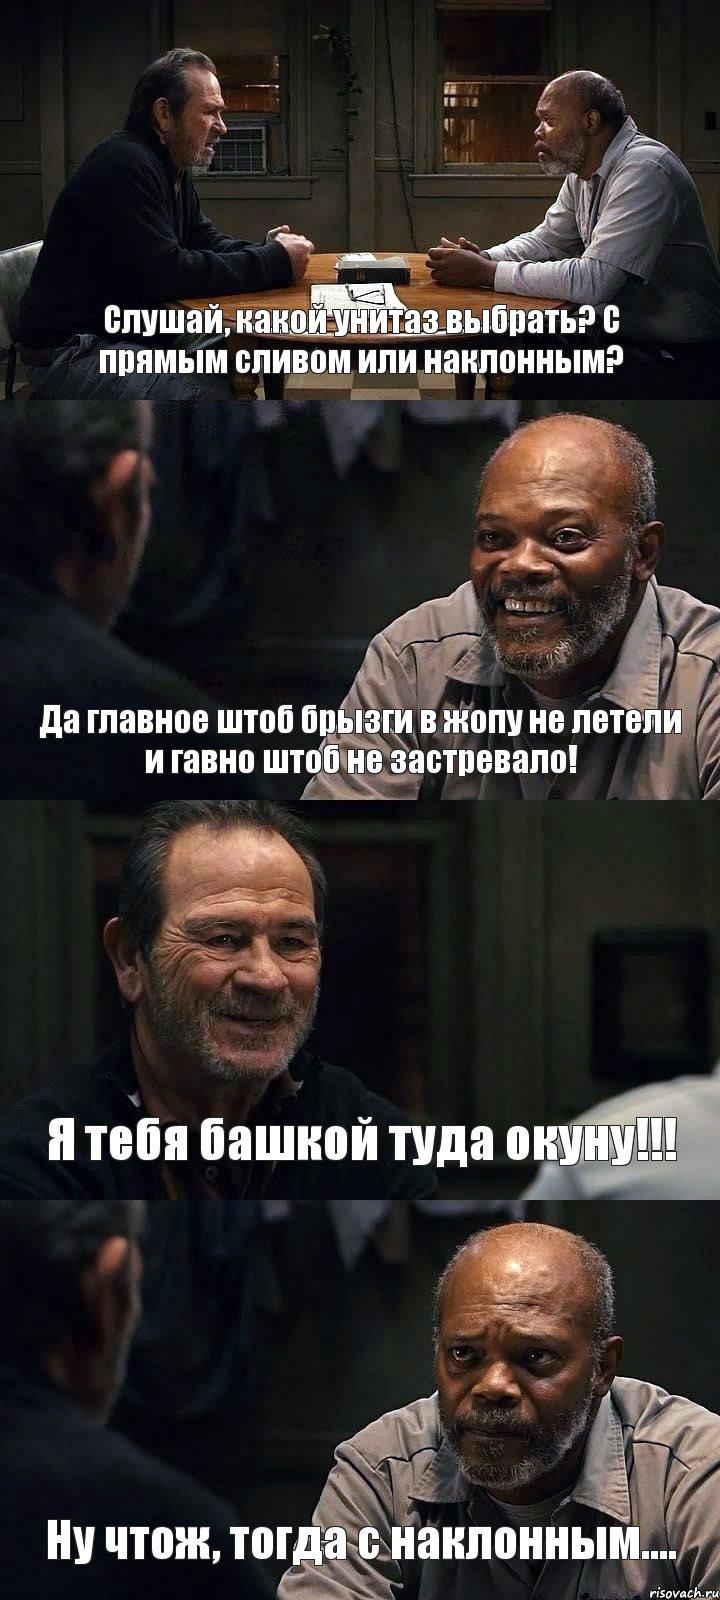 suchki-tvoego-goroda